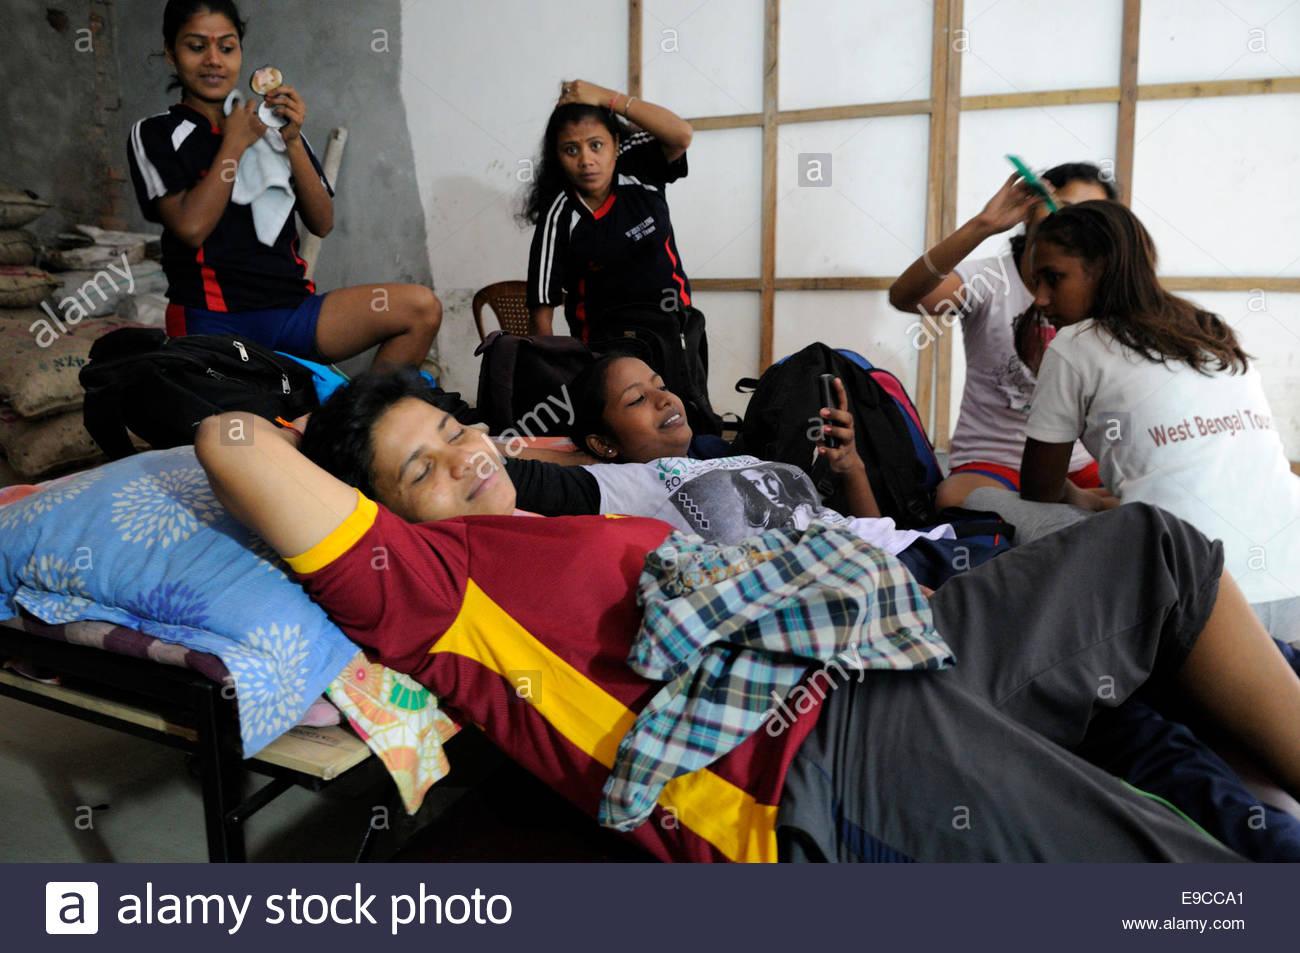 Virgin porn nepali nurse